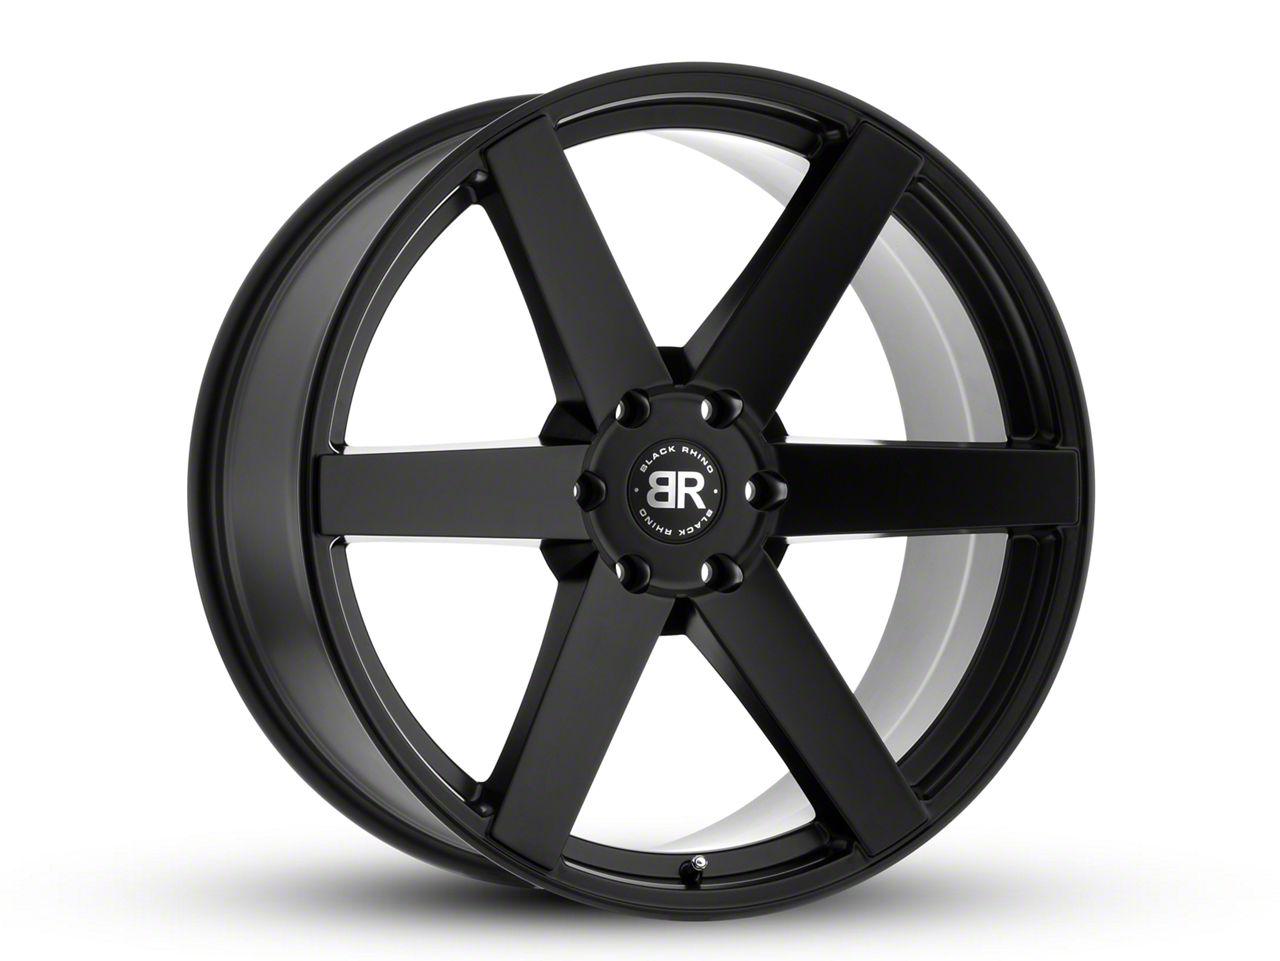 Black Rhino Karoo Matte Black 6-Lug Wheel - 20x9.5 (99-18 Silverado 1500)